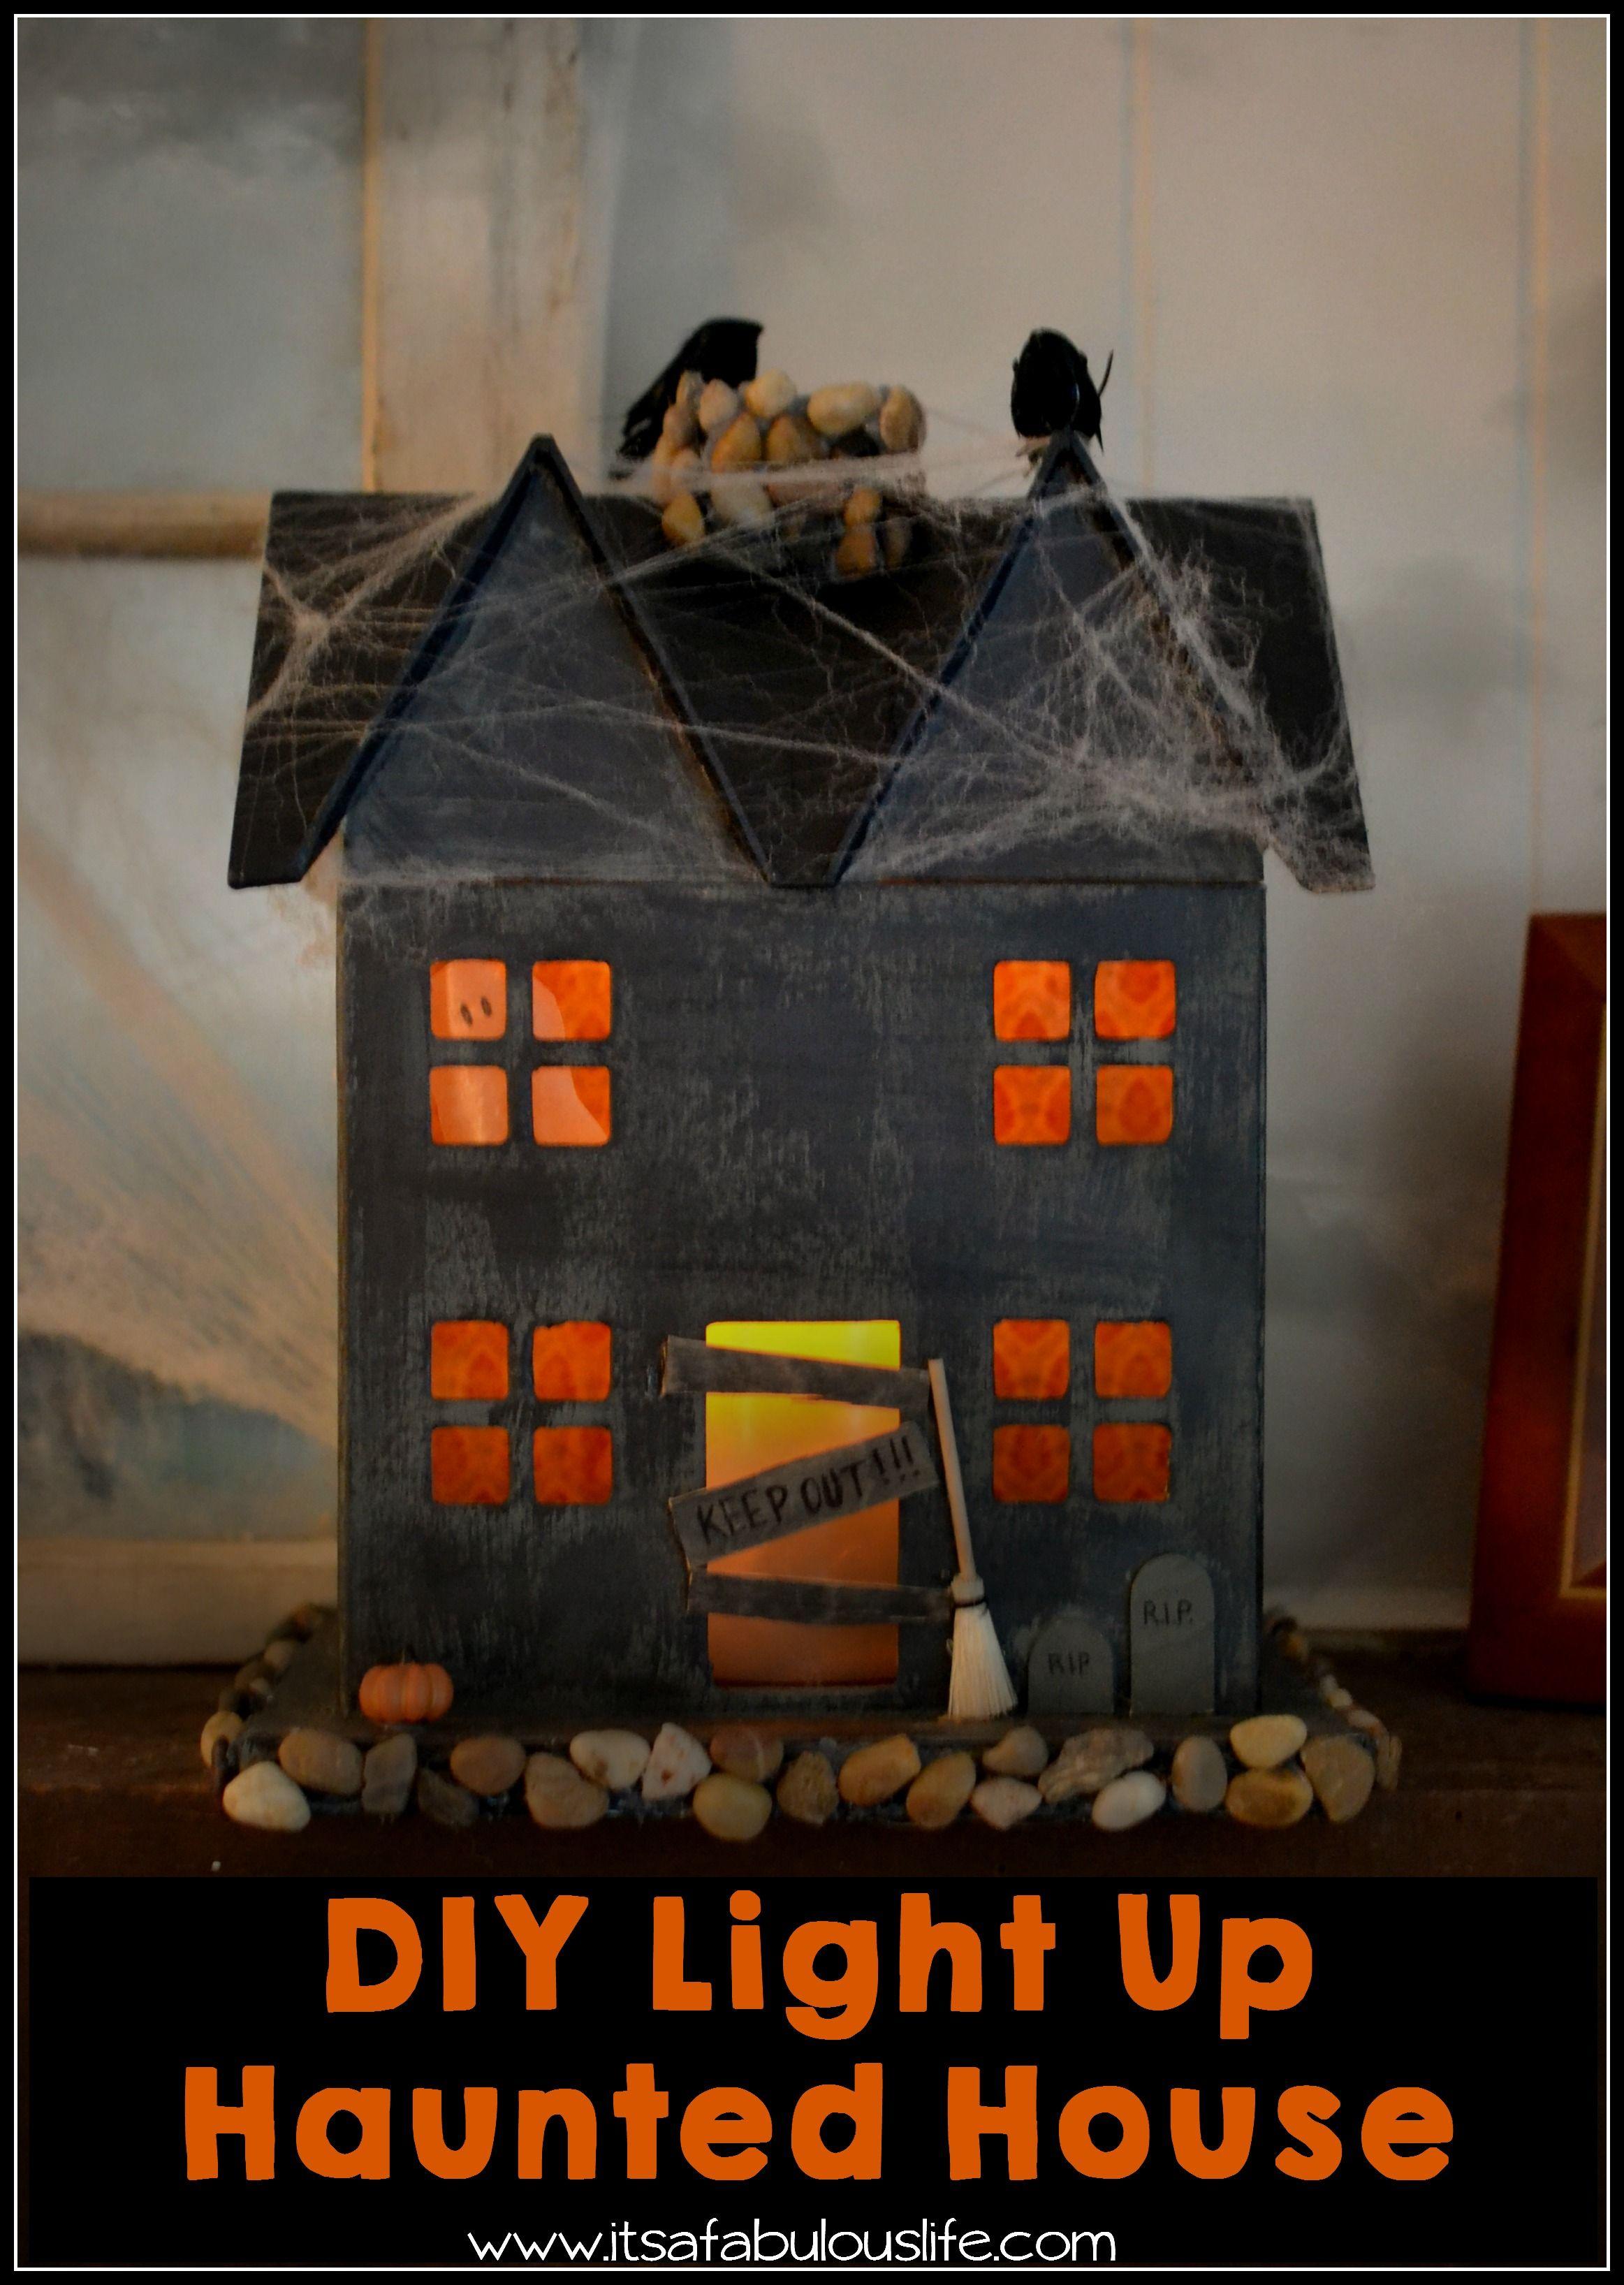 Diy Light Up Haunted House Easy Fun Halloween Craft Its A Fsbcard Fun Easy Halloween Crafts Fun Halloween Crafts Halloween Crafts